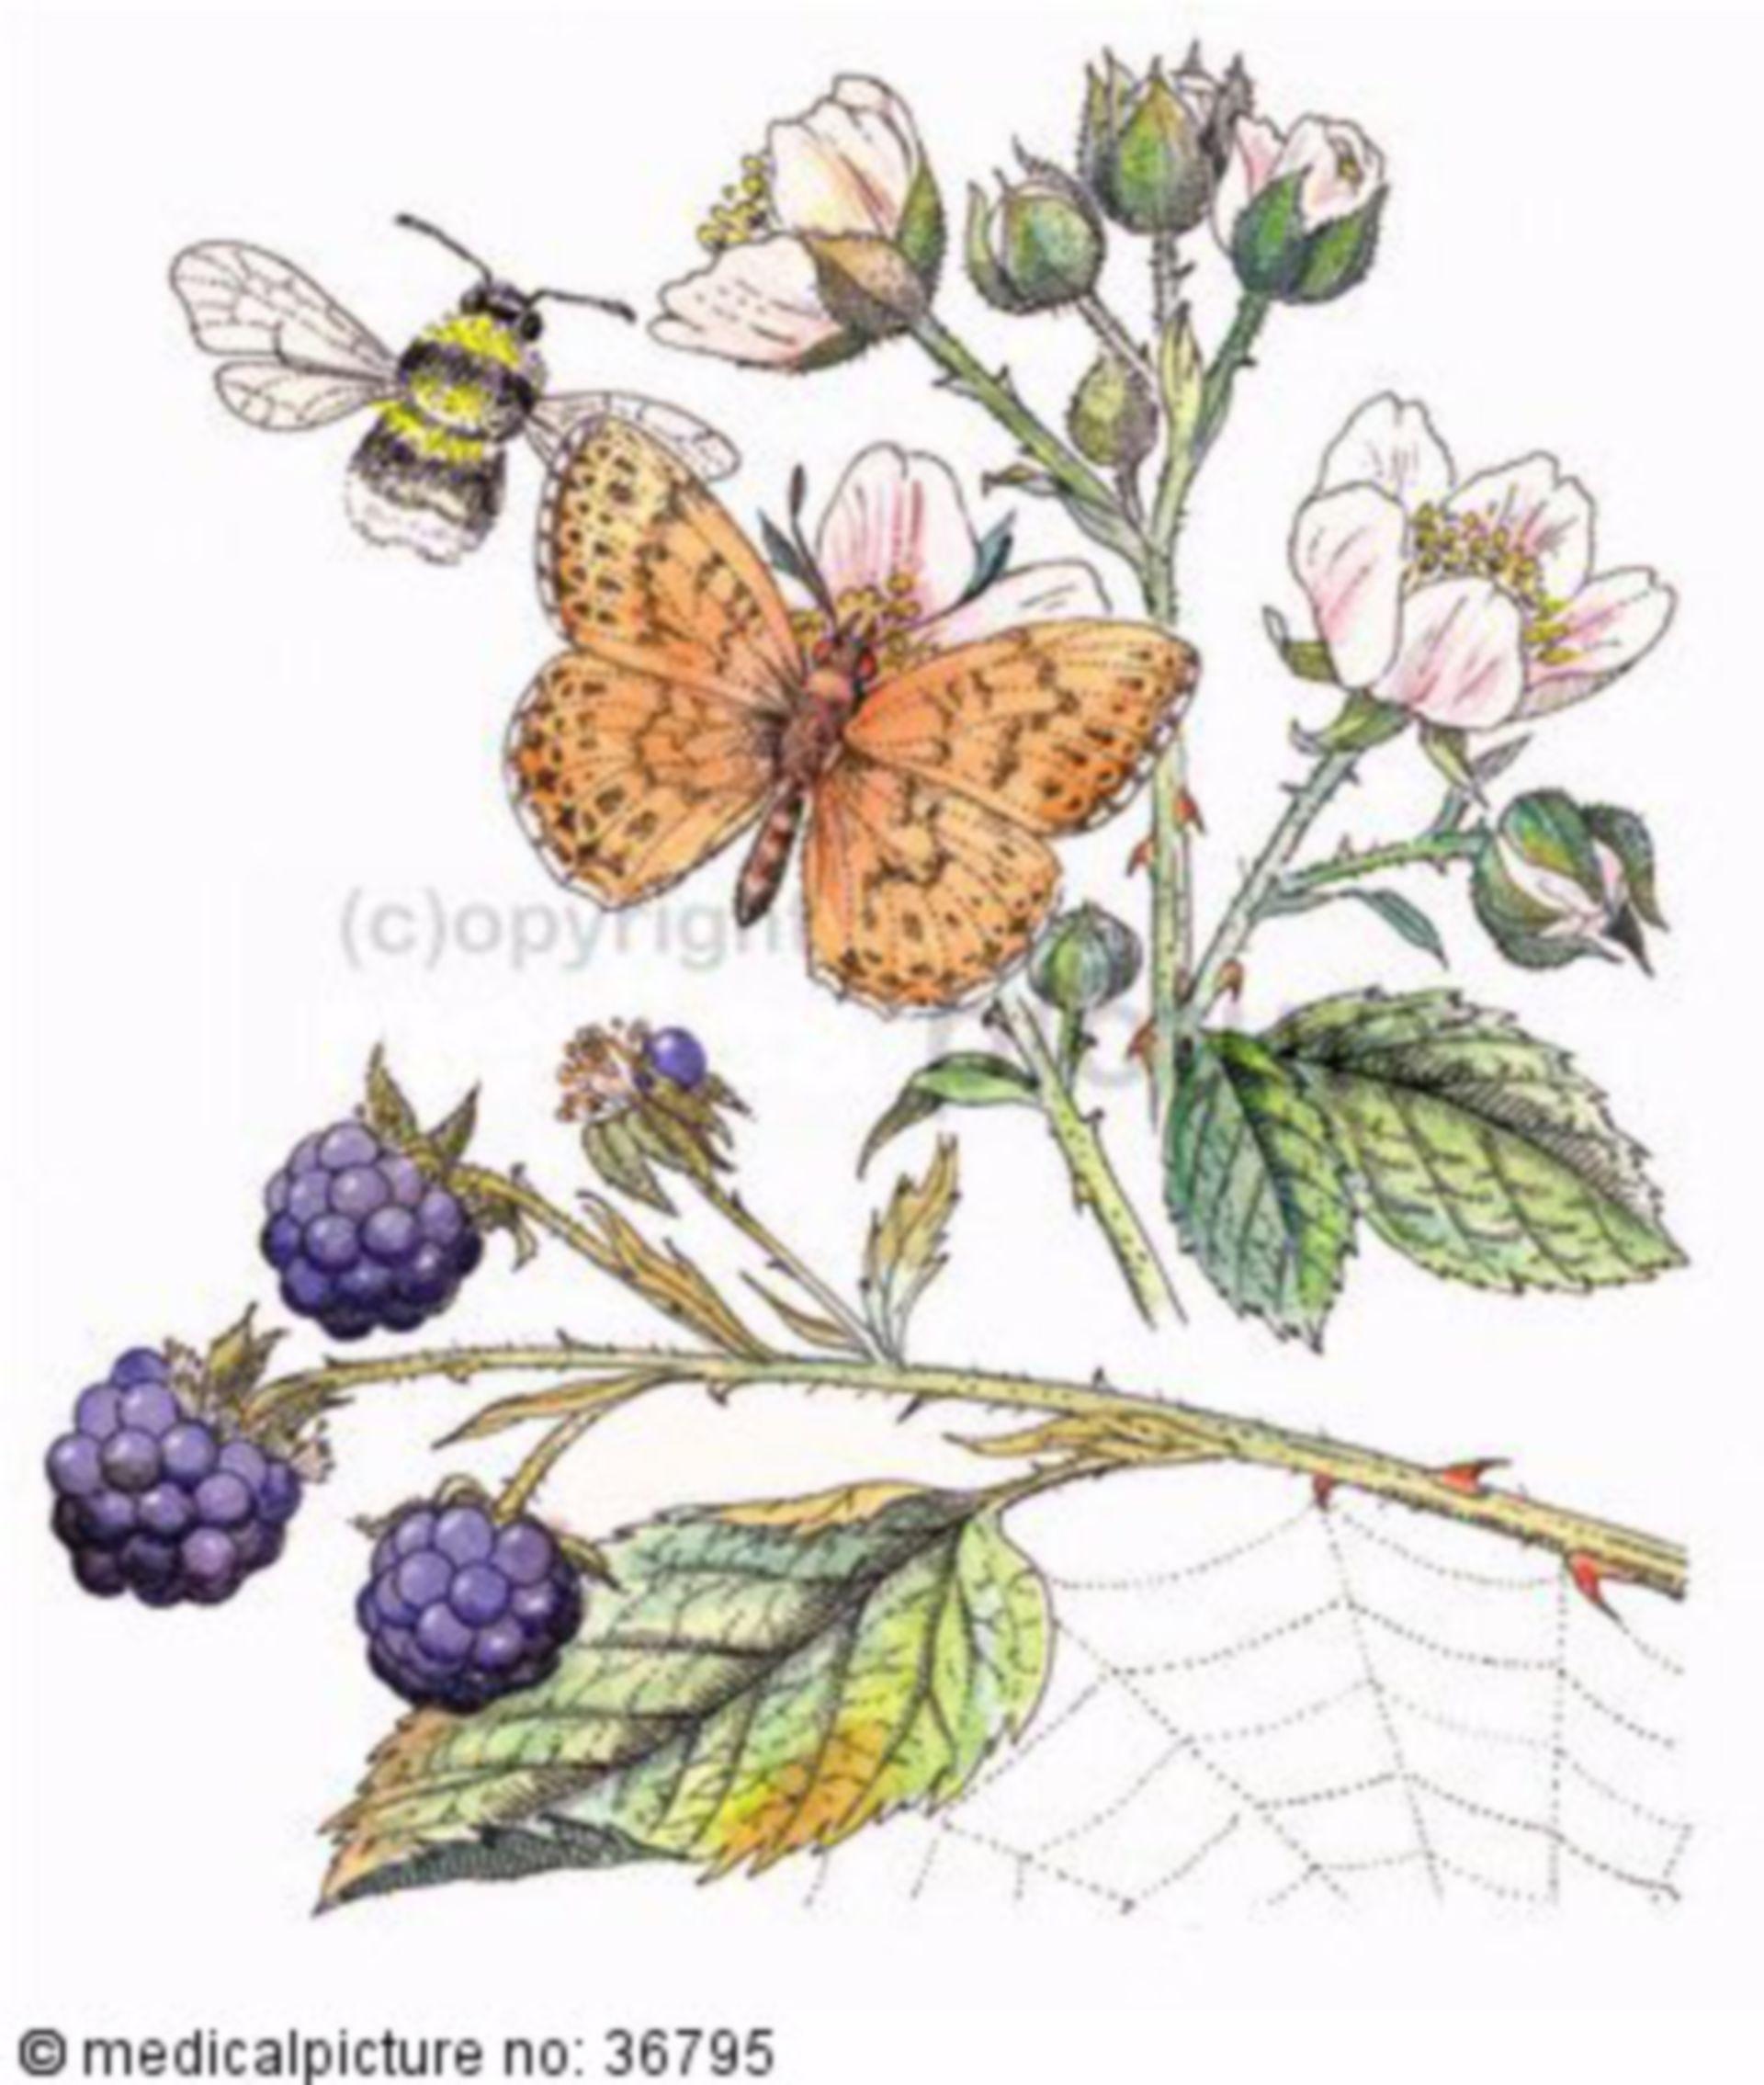 Strauch, Rubus fruticosus, Brombeeren